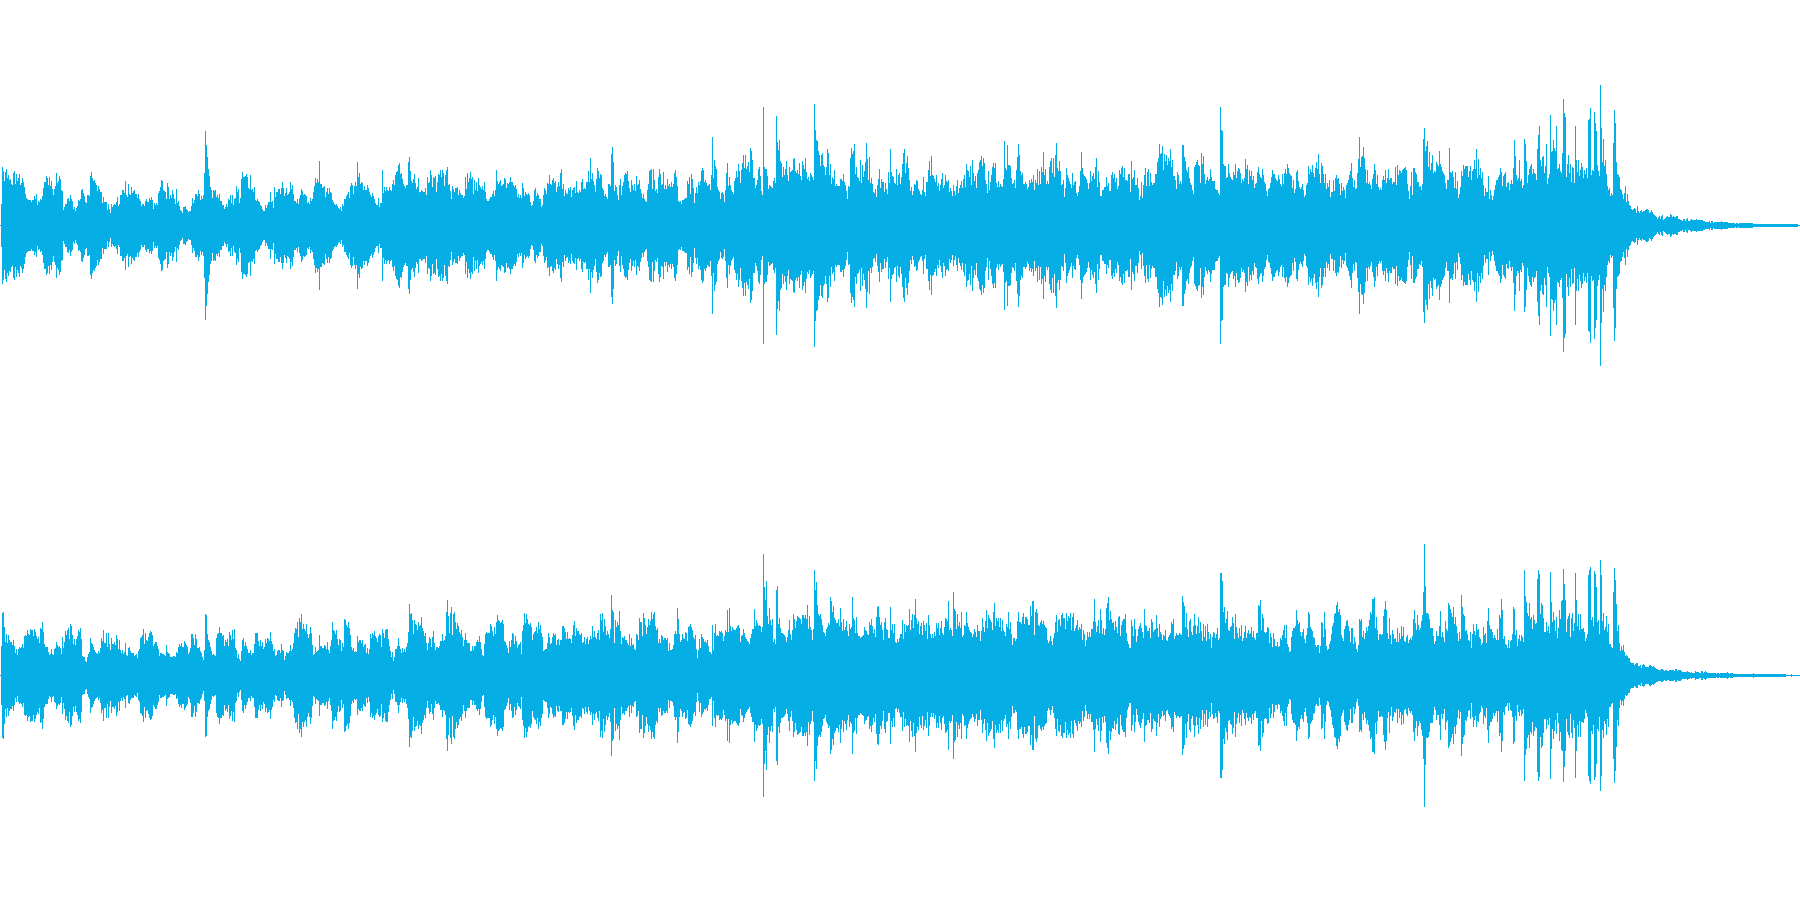 Soundtrack 4の再生済みの波形